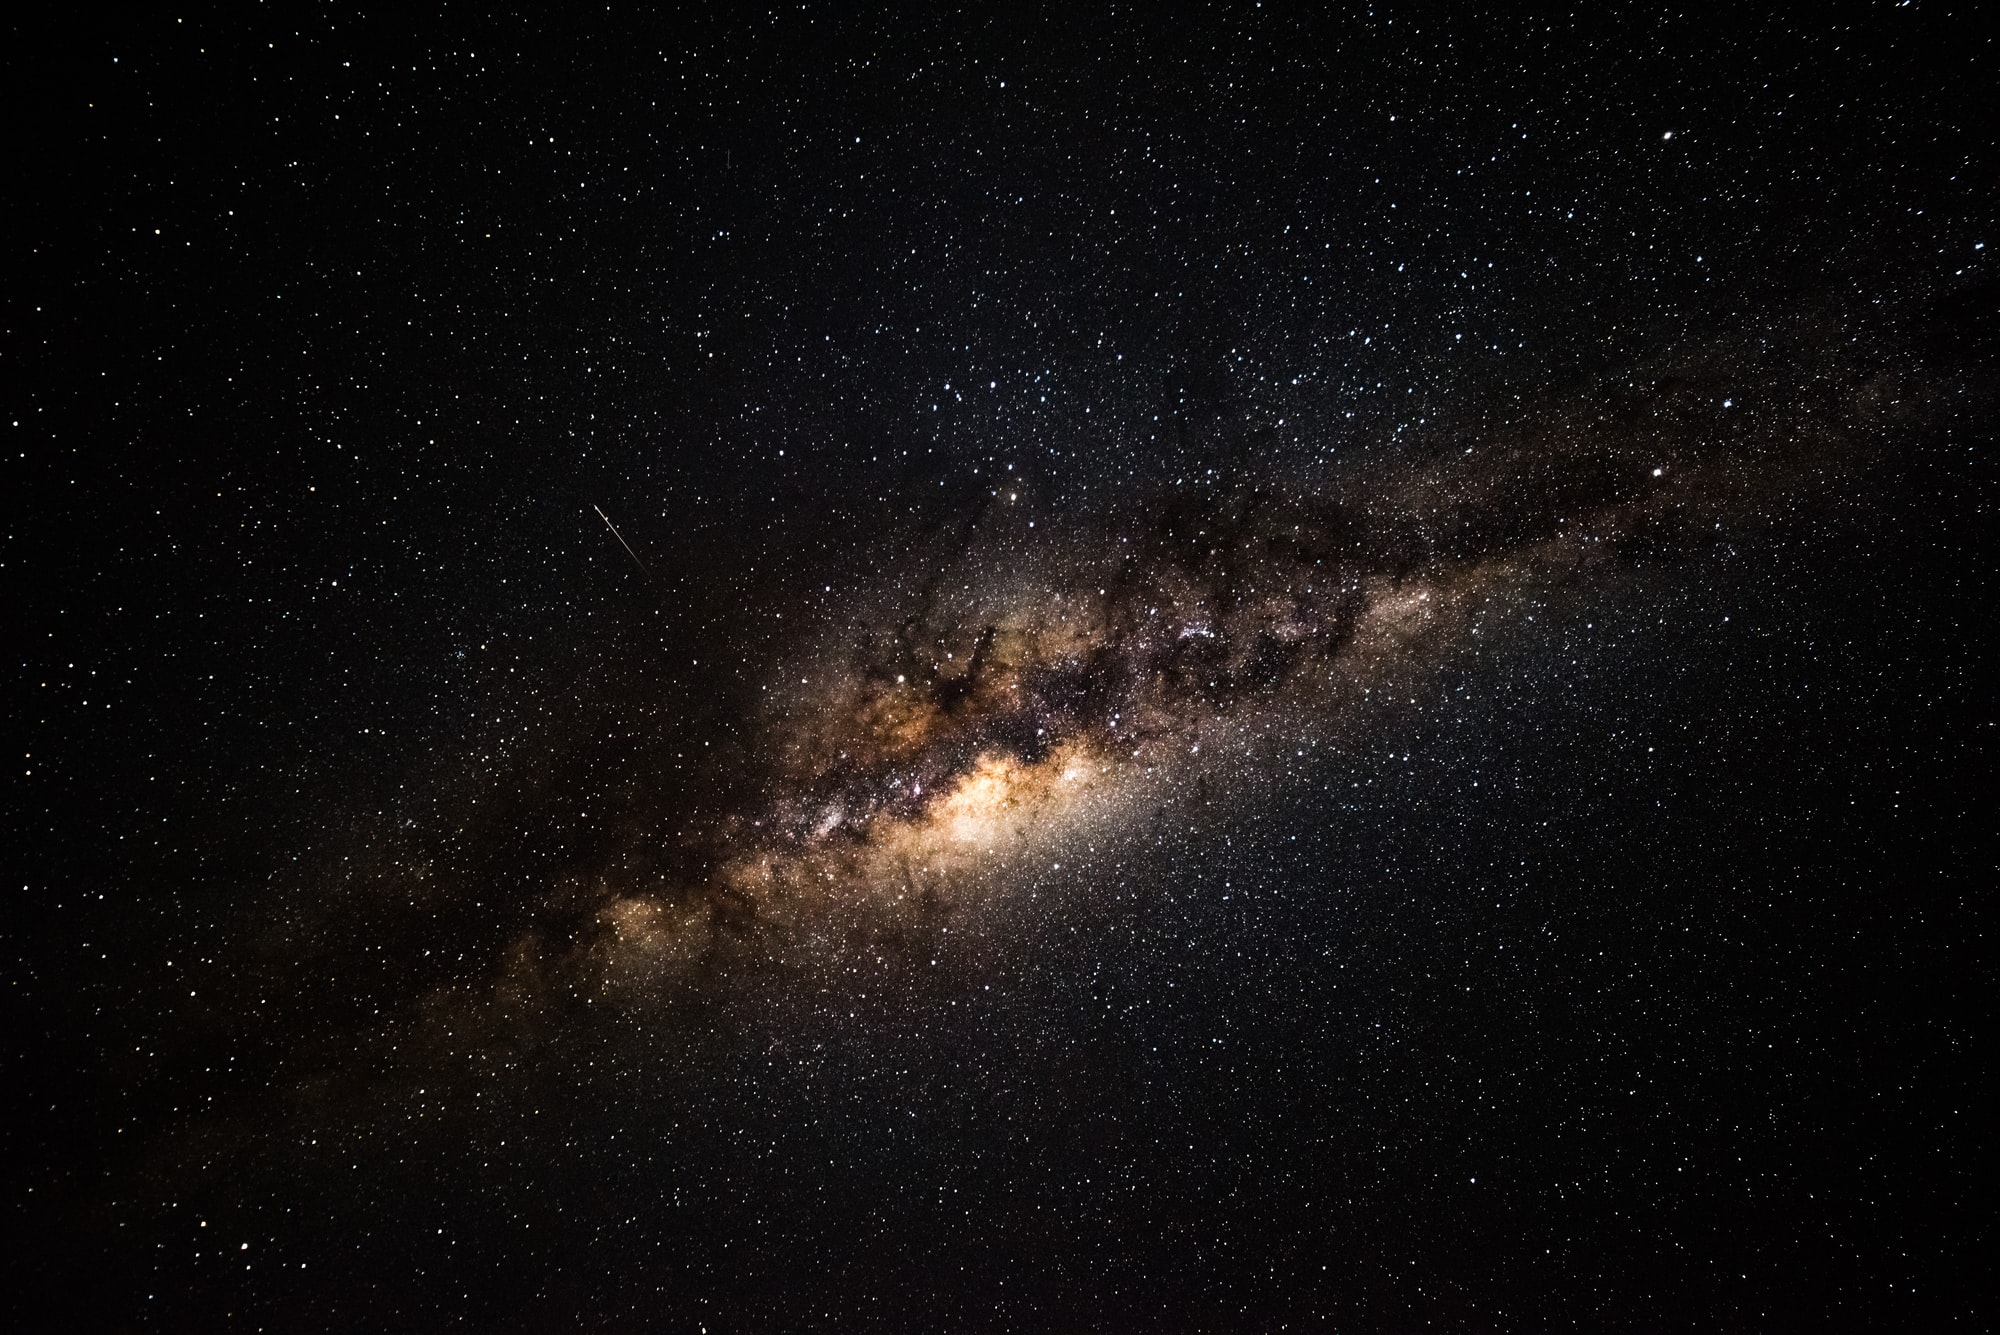 Michael Benson's Amazing Planetary Images